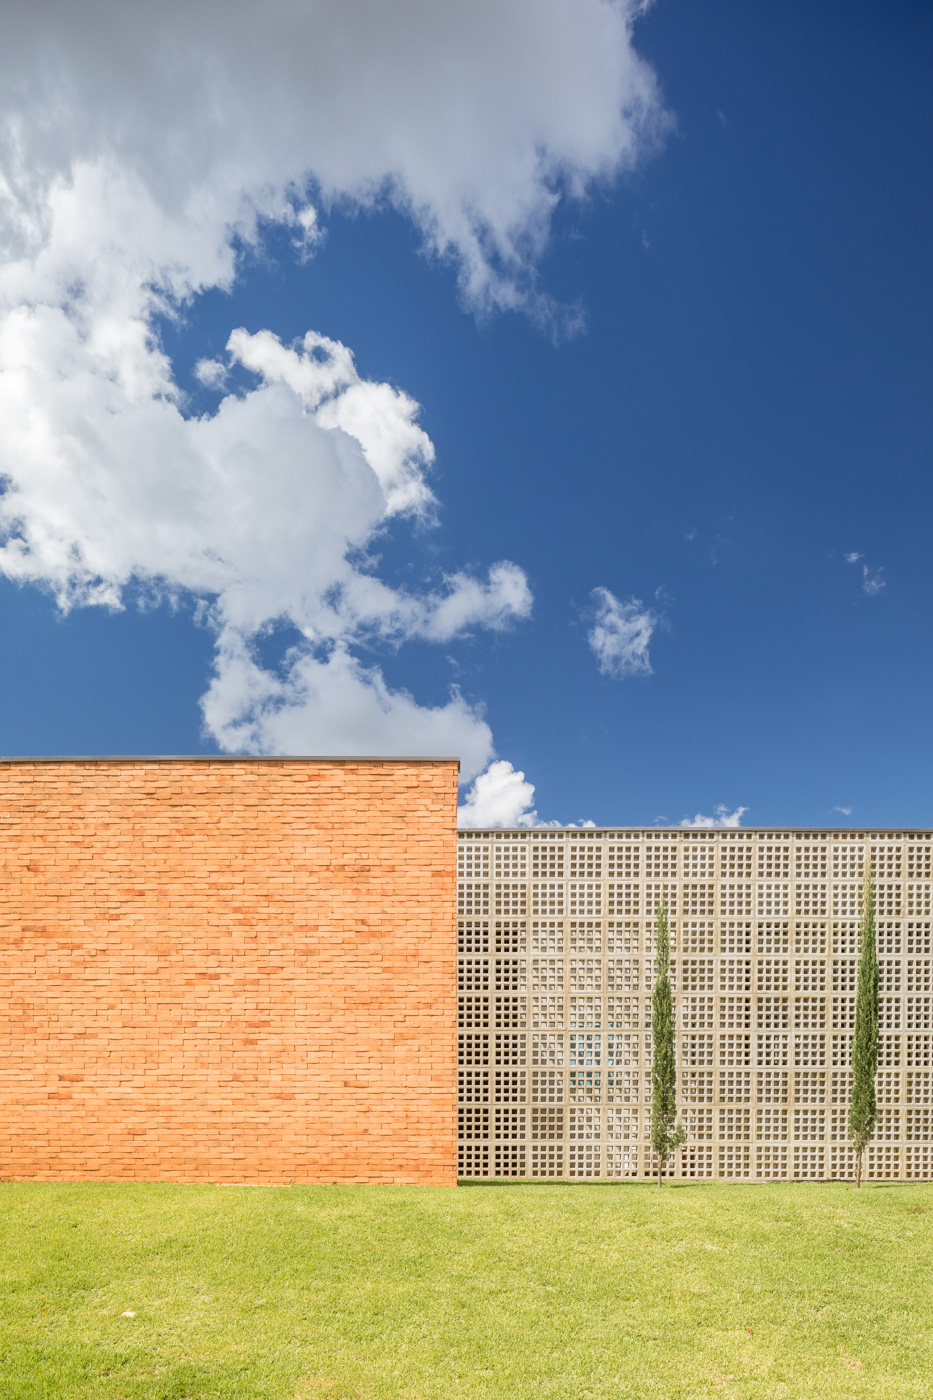 Mova-arquitetura-foto-haruo-mikami_B_306_Baixa.jpg